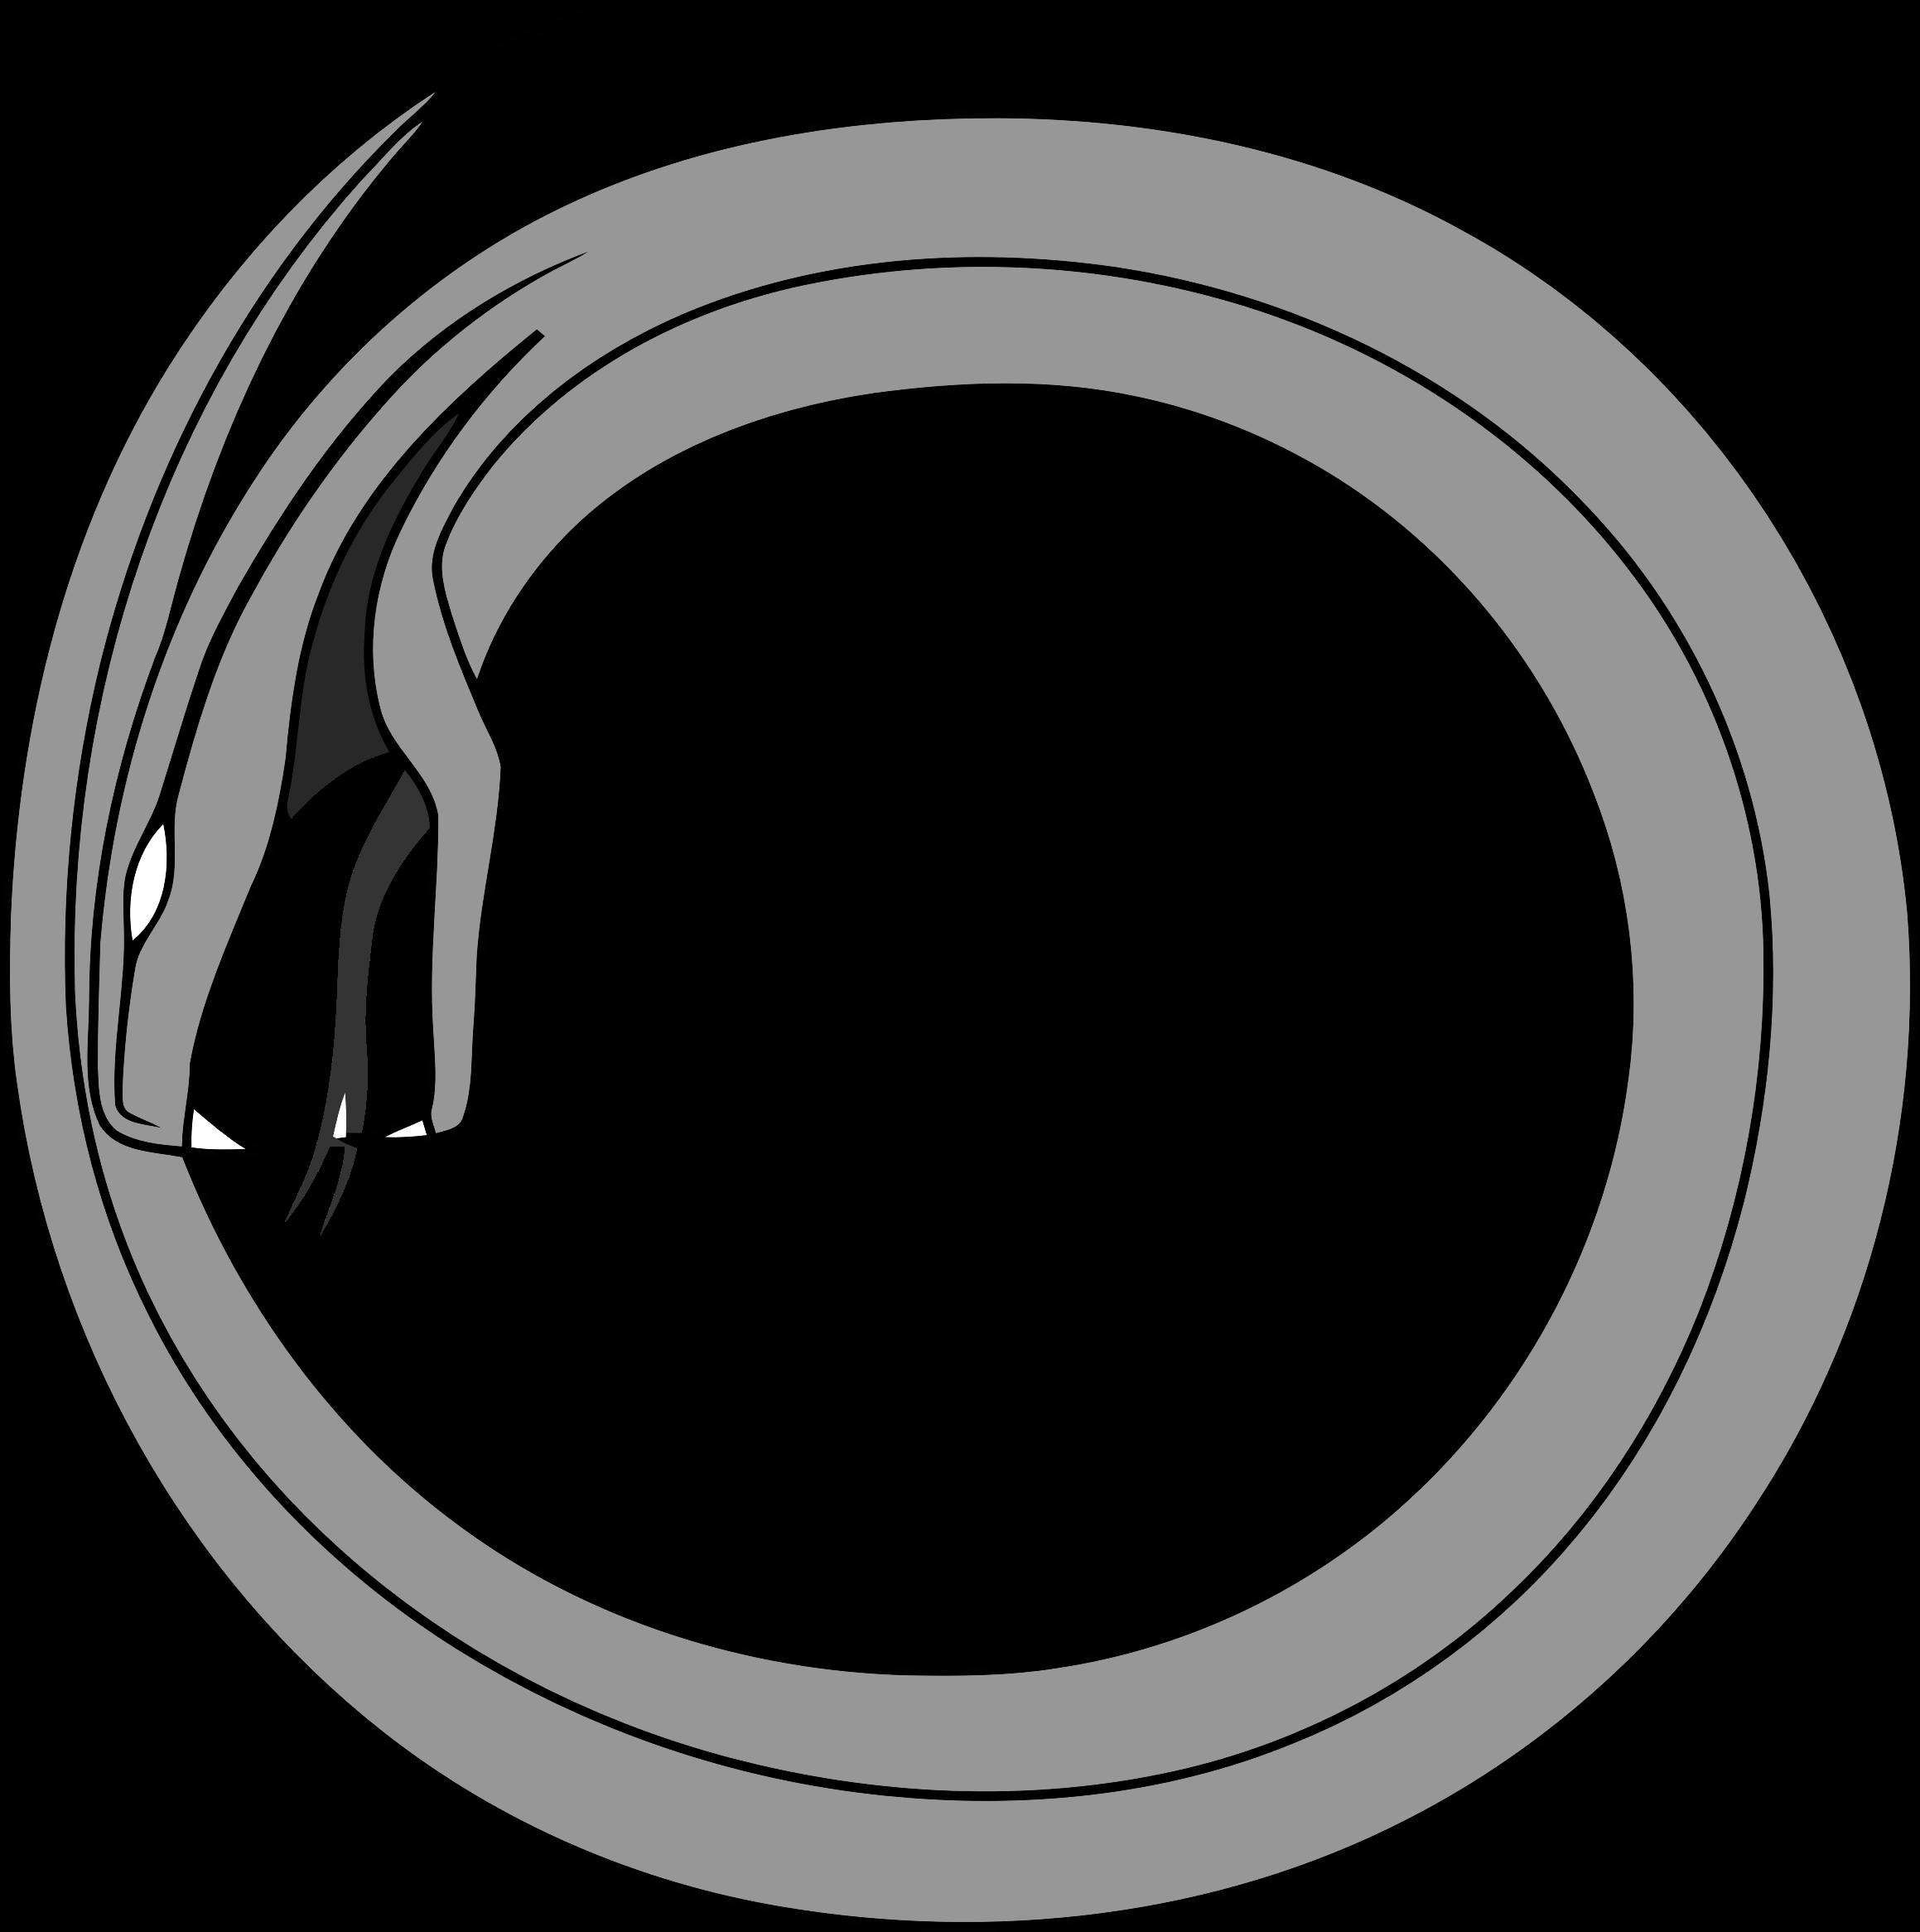 Viper svg #2, Download drawings